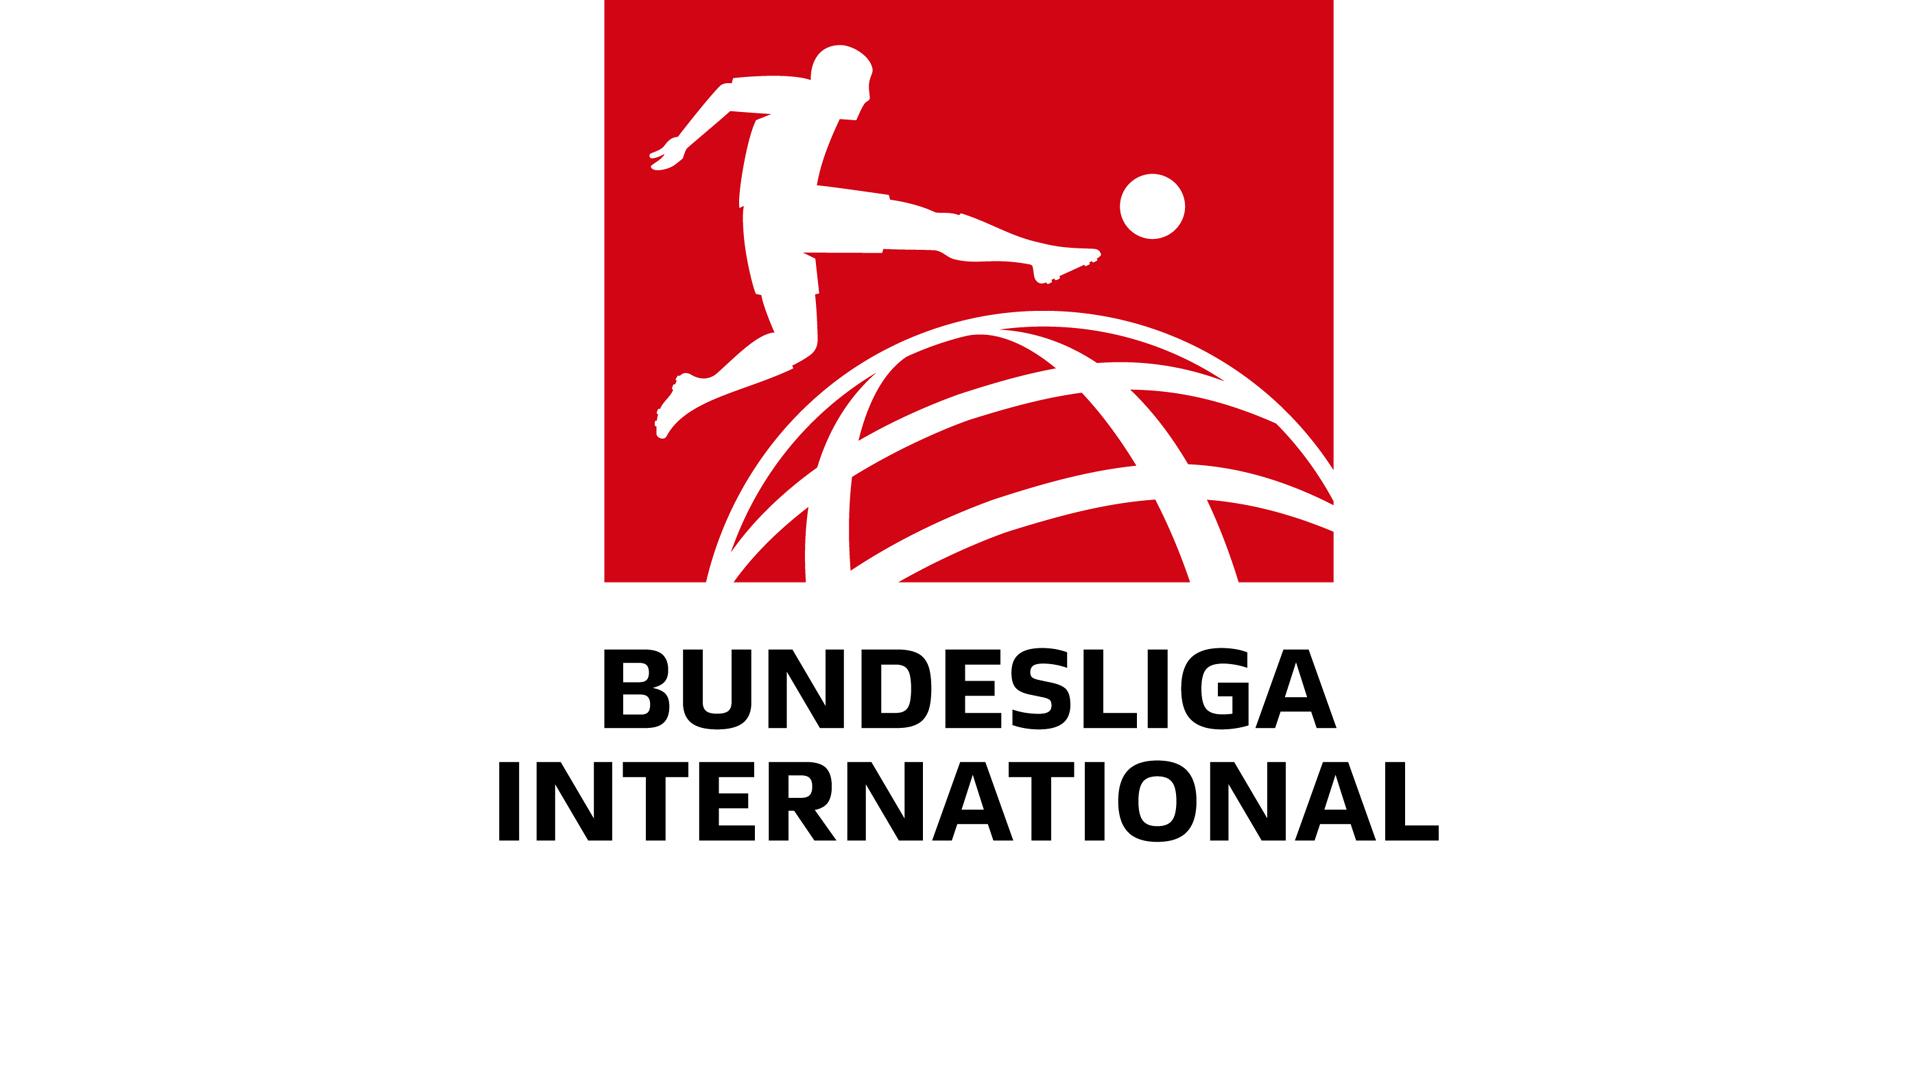 No Bundesliga in PES until 2022 - pes-news com